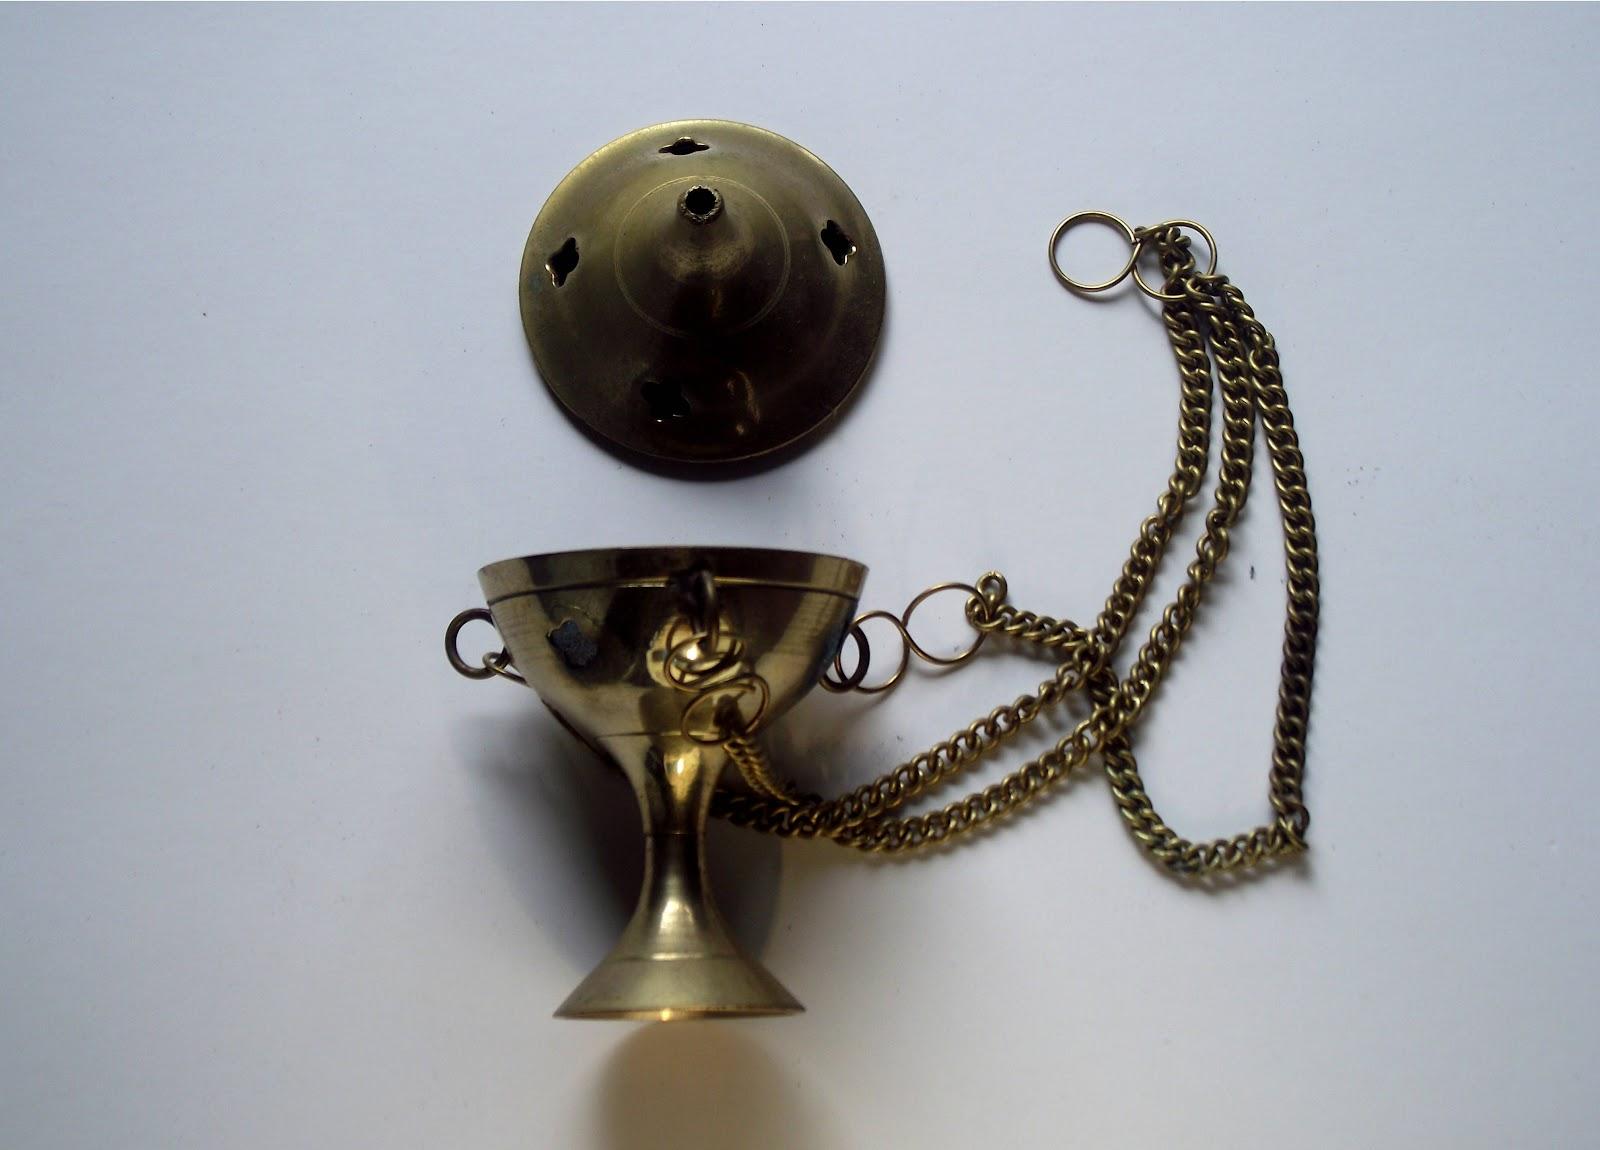 Brass_Incense_Censer_Thurible.jpg